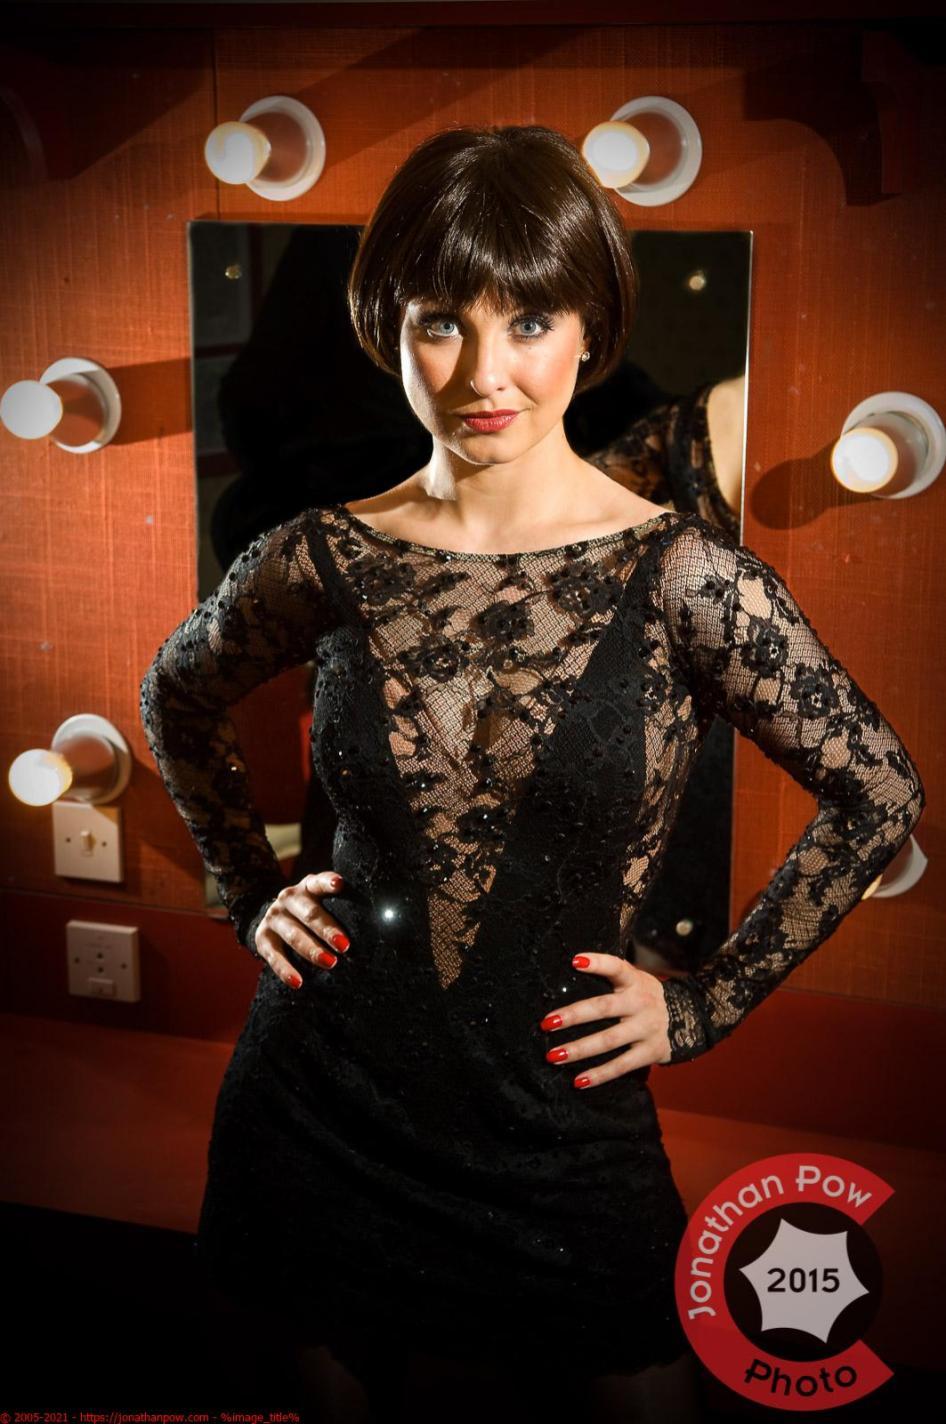 Acting headshot photographer - Actress Emma Bolton in Chicago